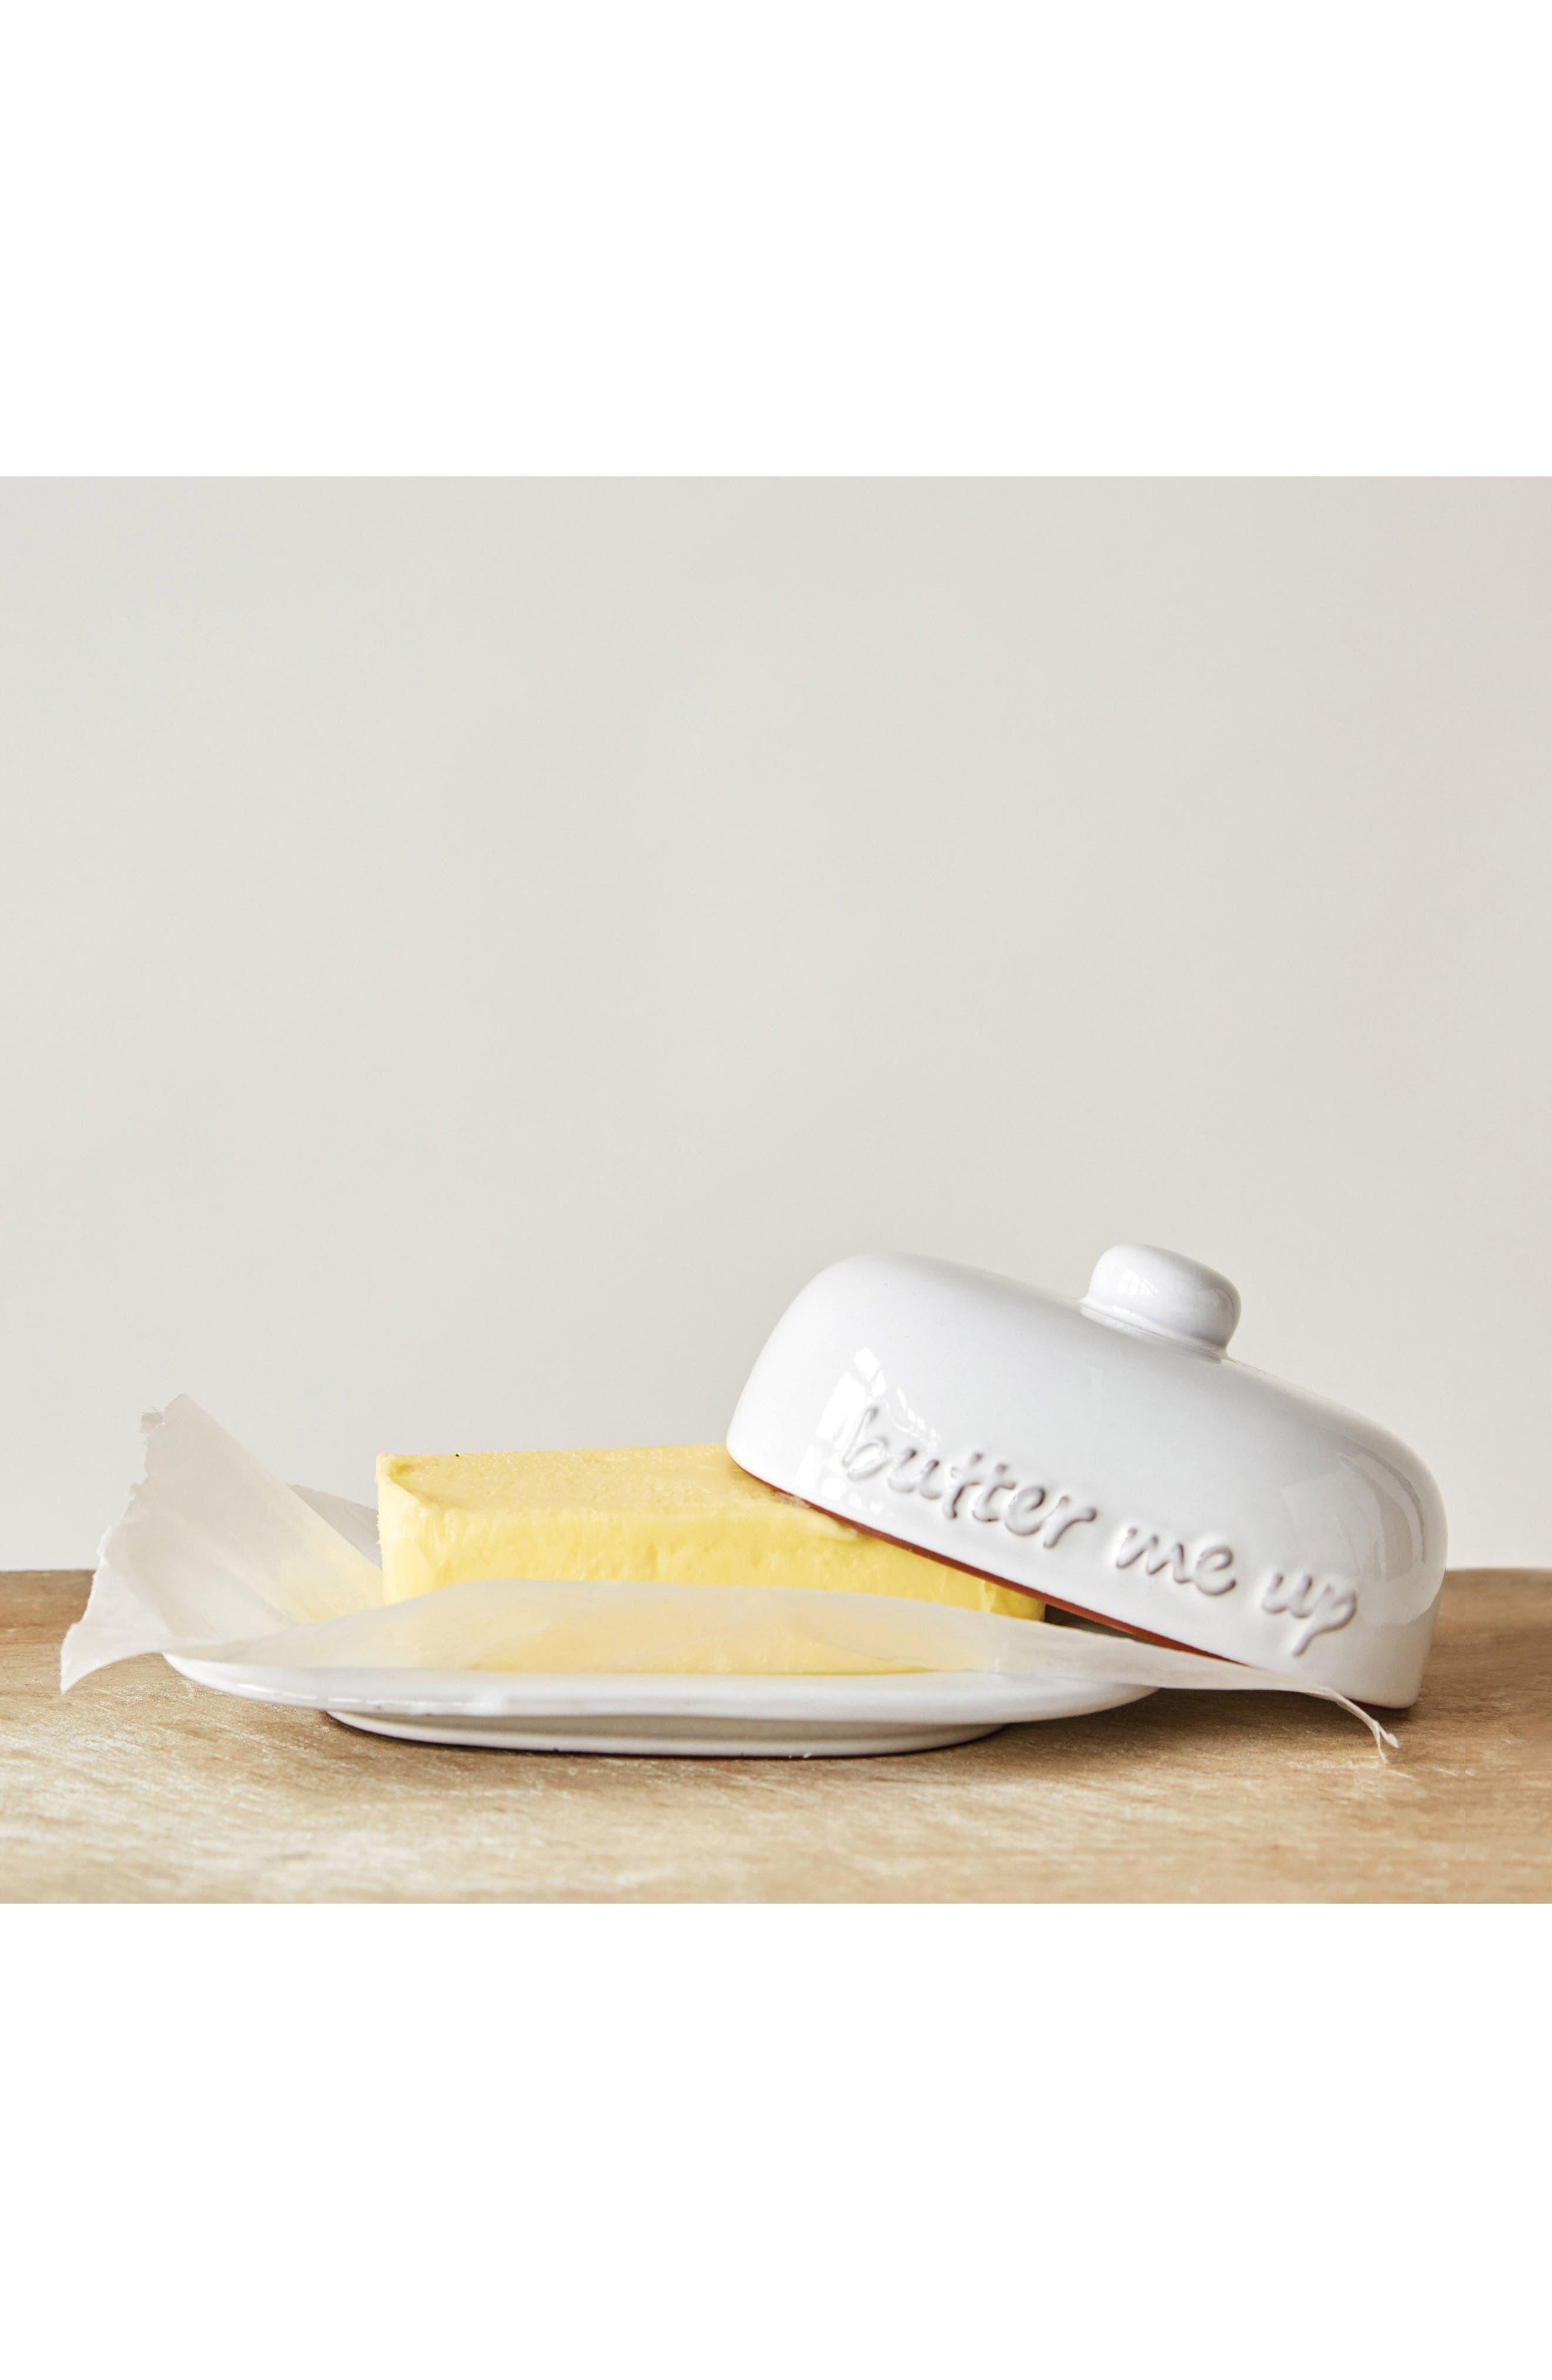 Butter Me Up Ceramic Butter Dish,                             Alternate thumbnail 2, color,                             100